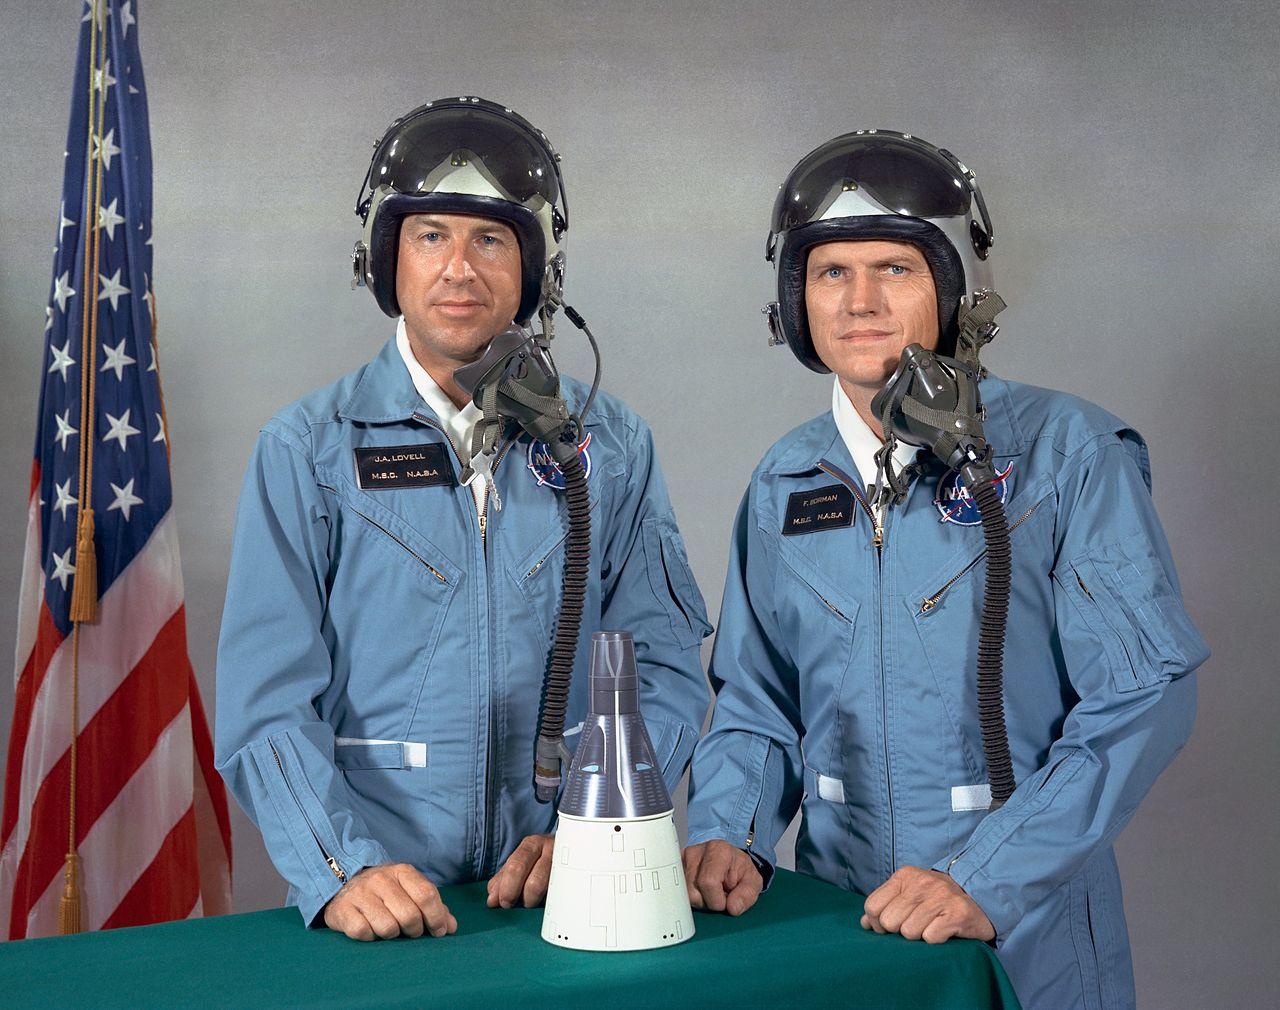 Jim Lovell (L) and Frank Borman (R)